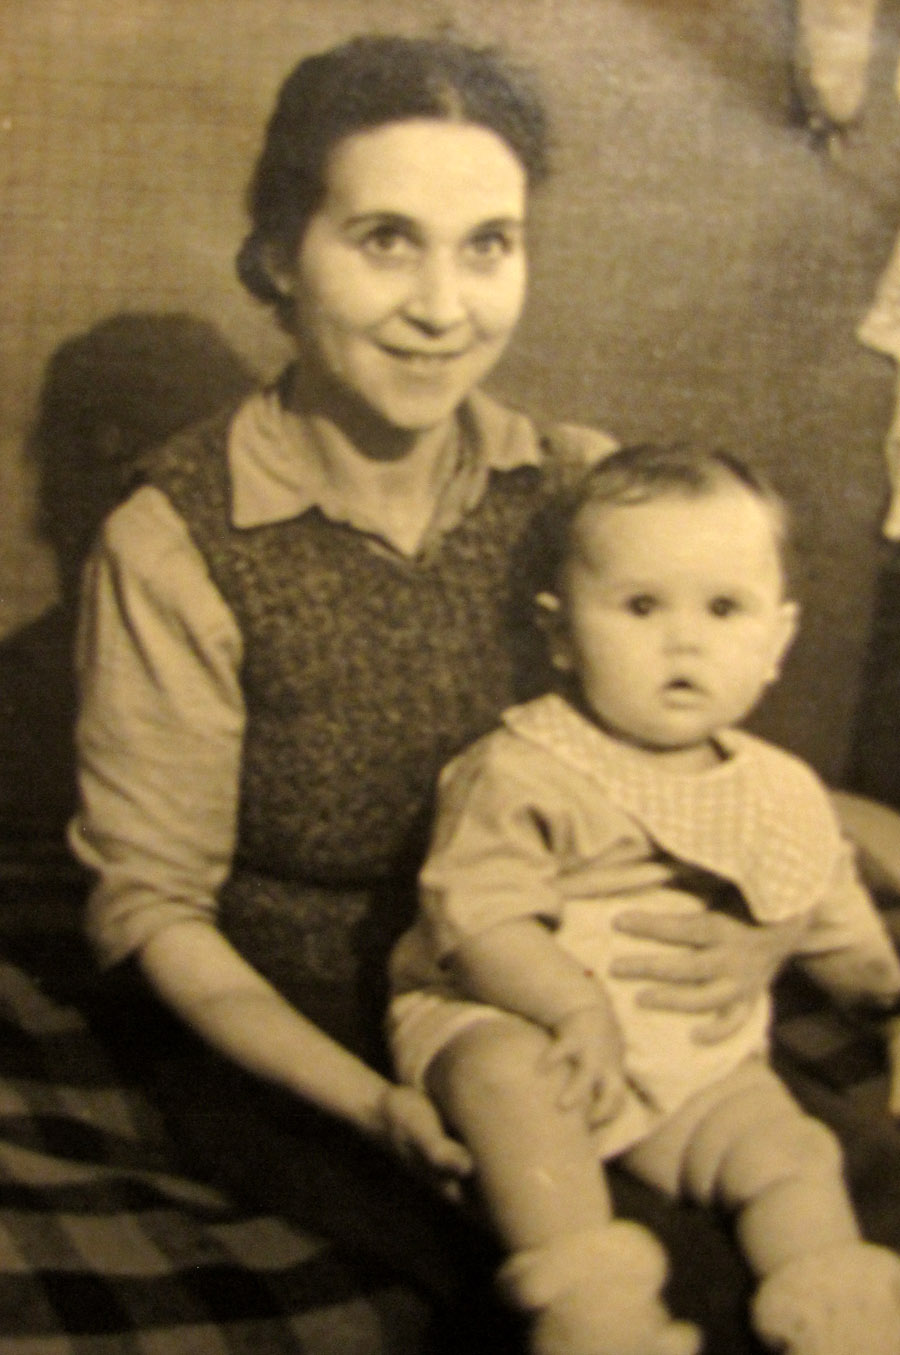 ELENA-TANYA-1940-s-03